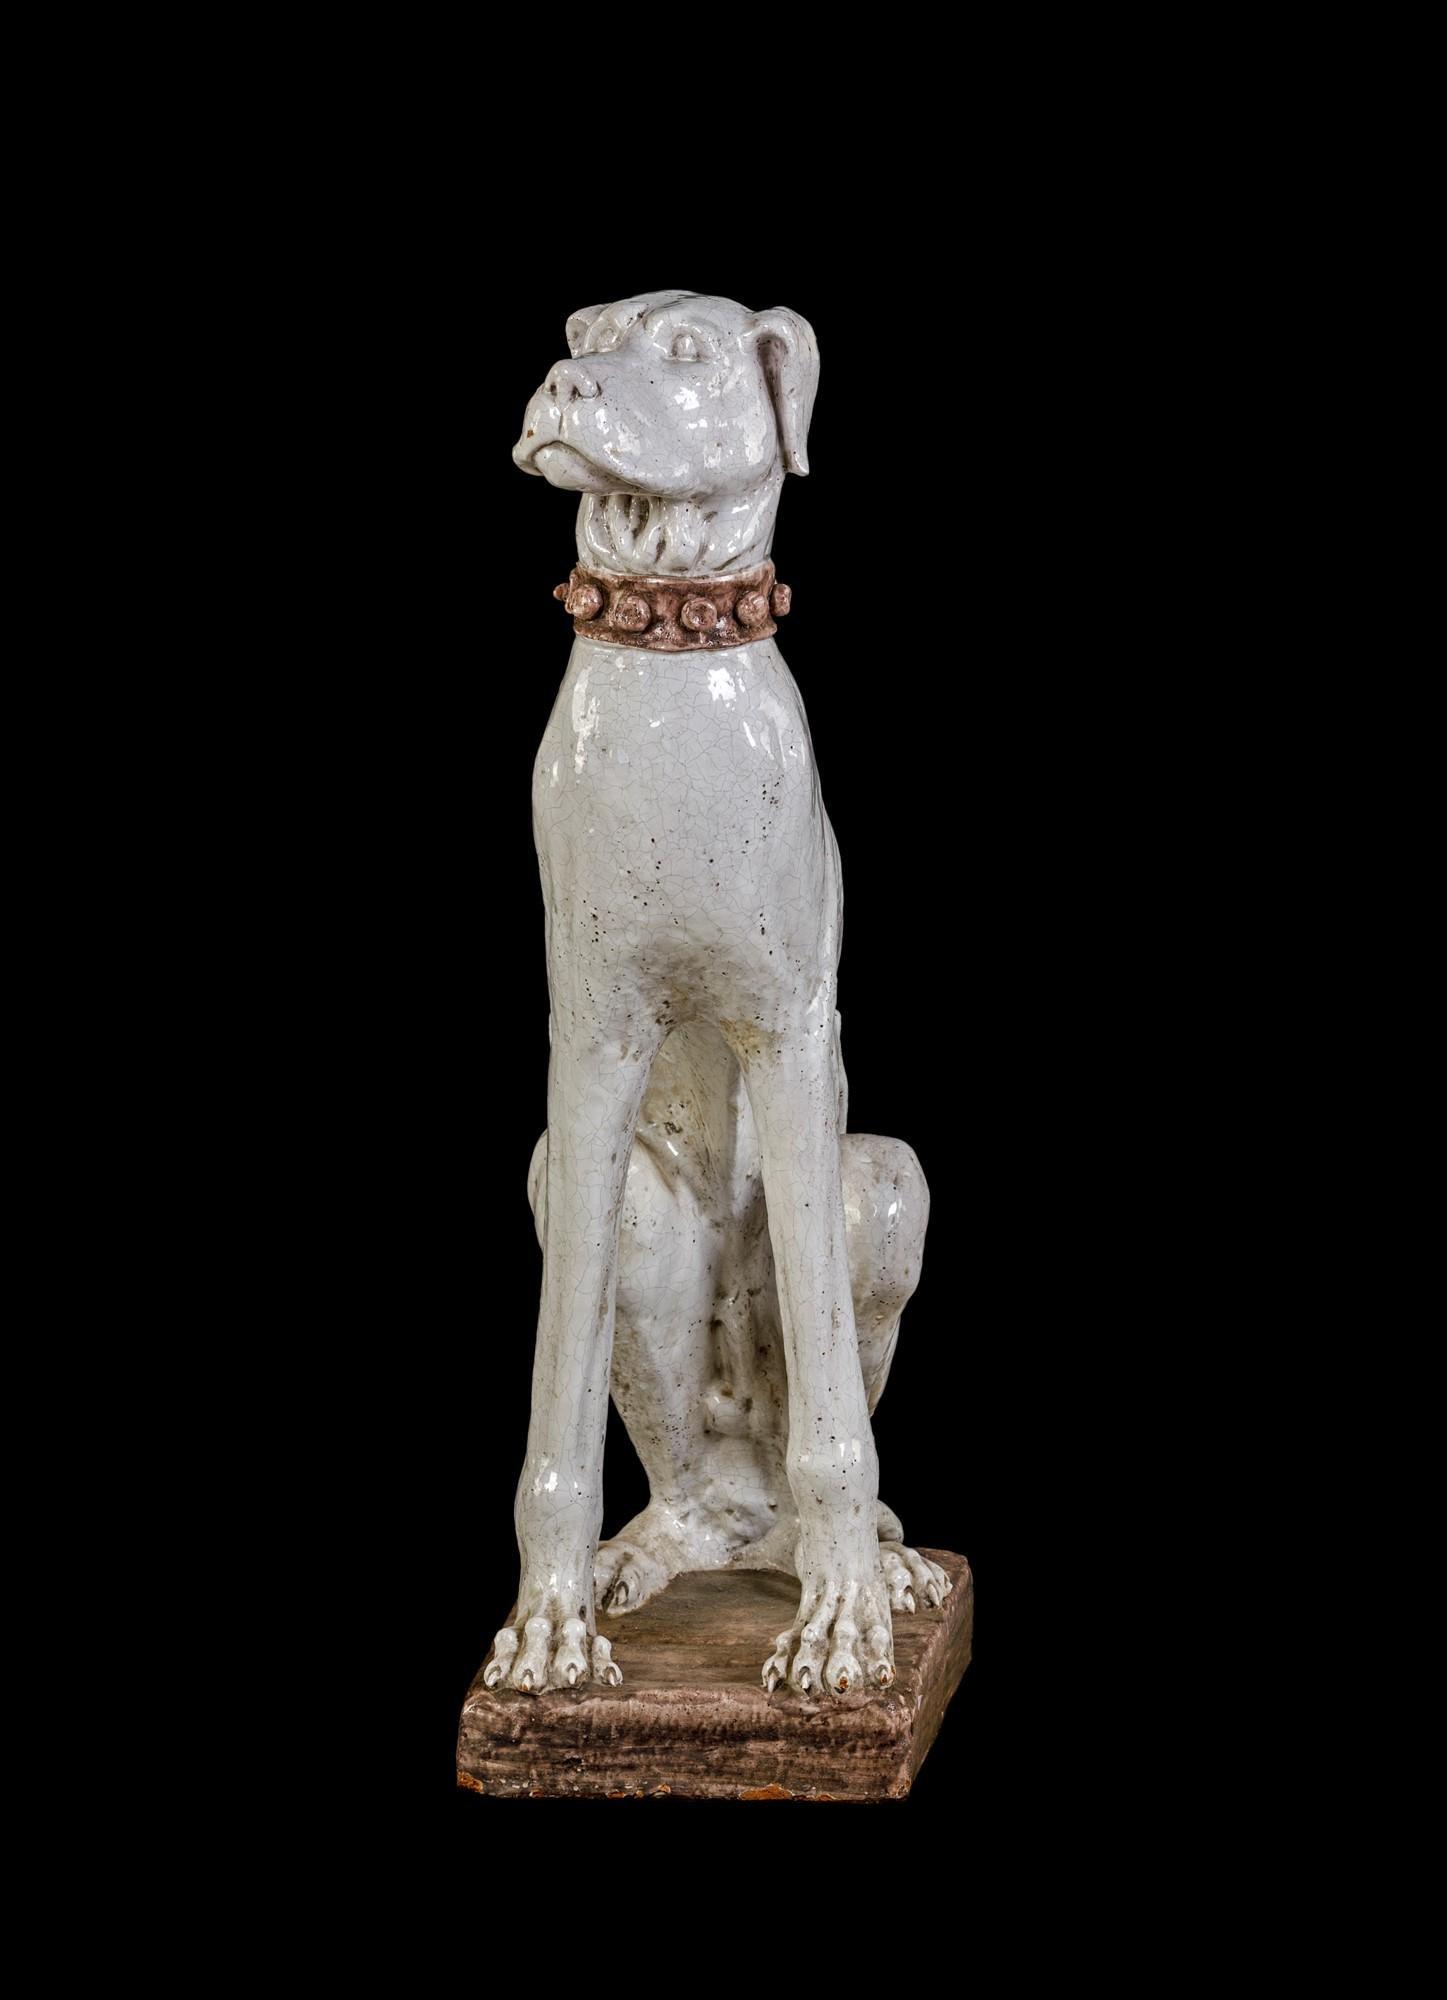 Big glazed terracotta sculpture of a dog